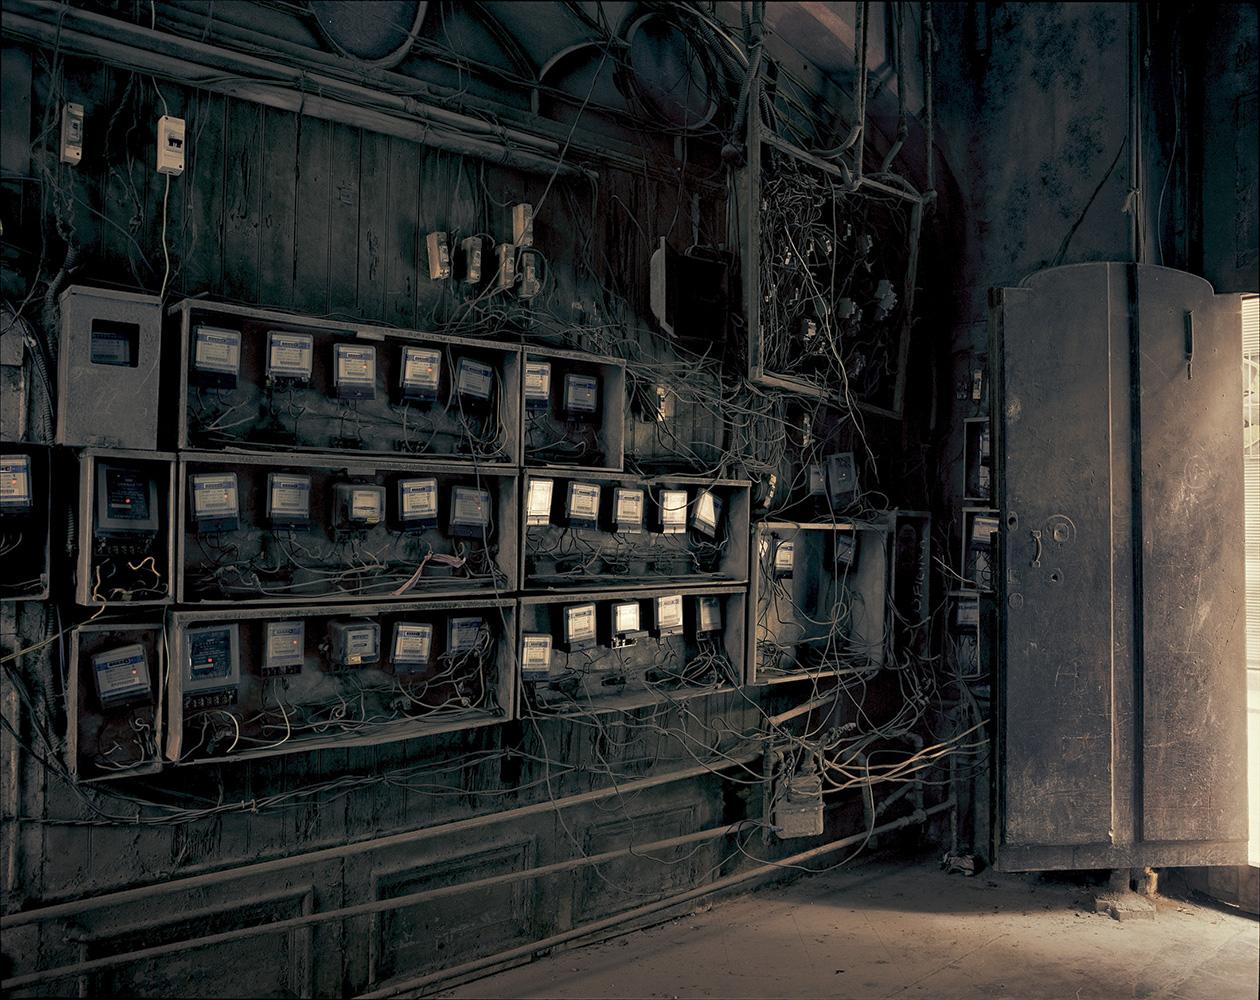 Electricity meters in a building in Old Havana.